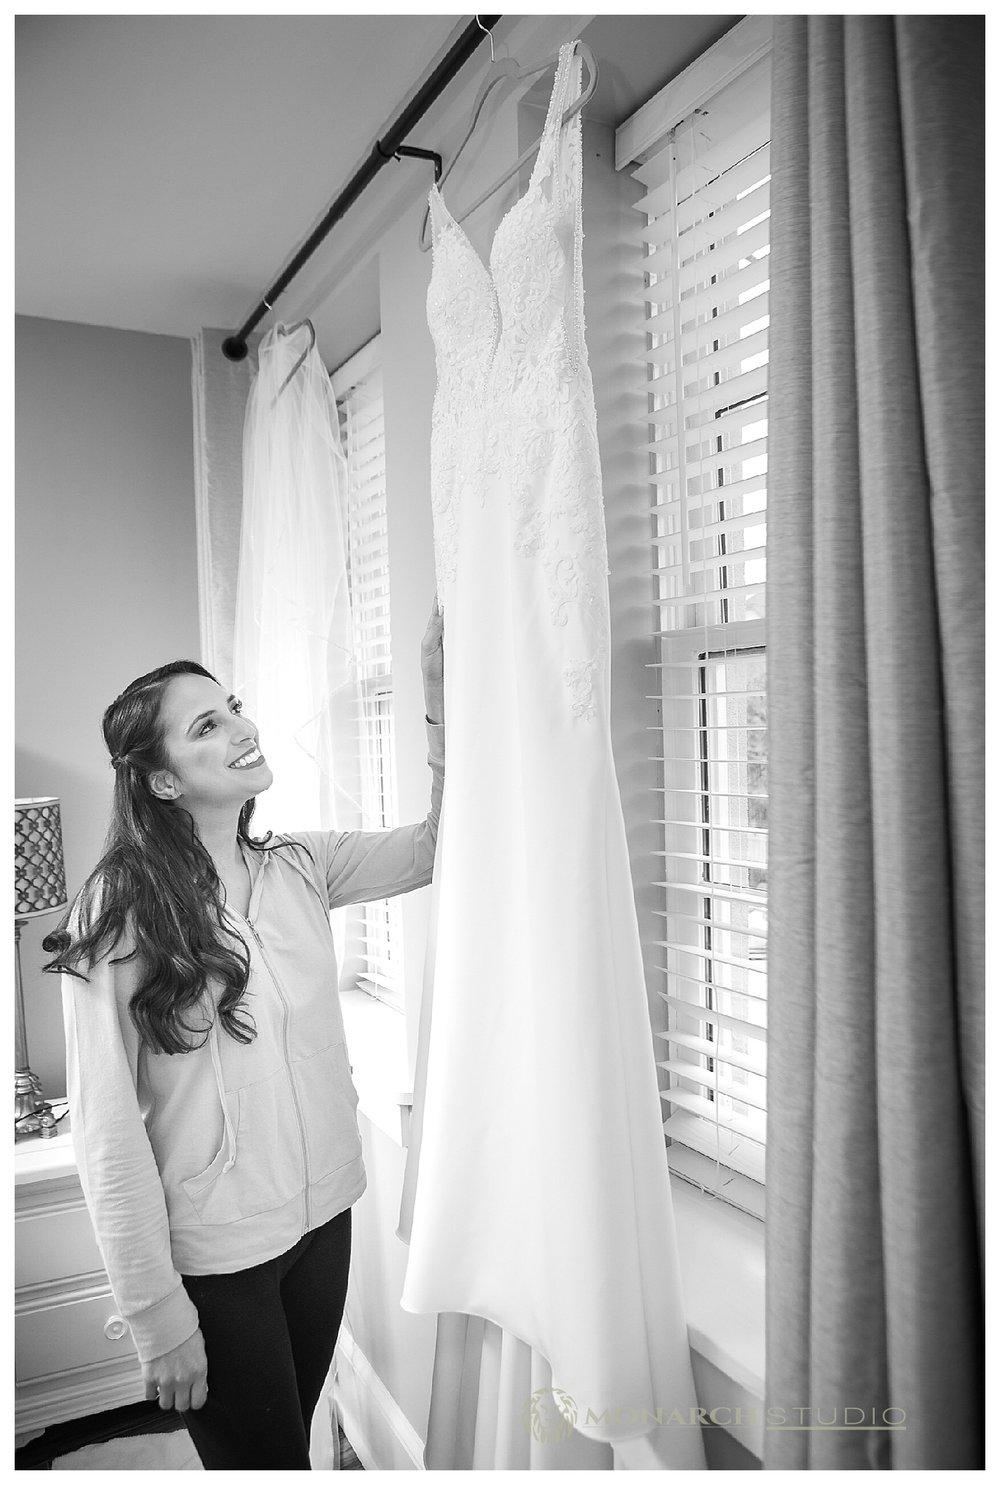 White Room Wedding Photography 001.JPG